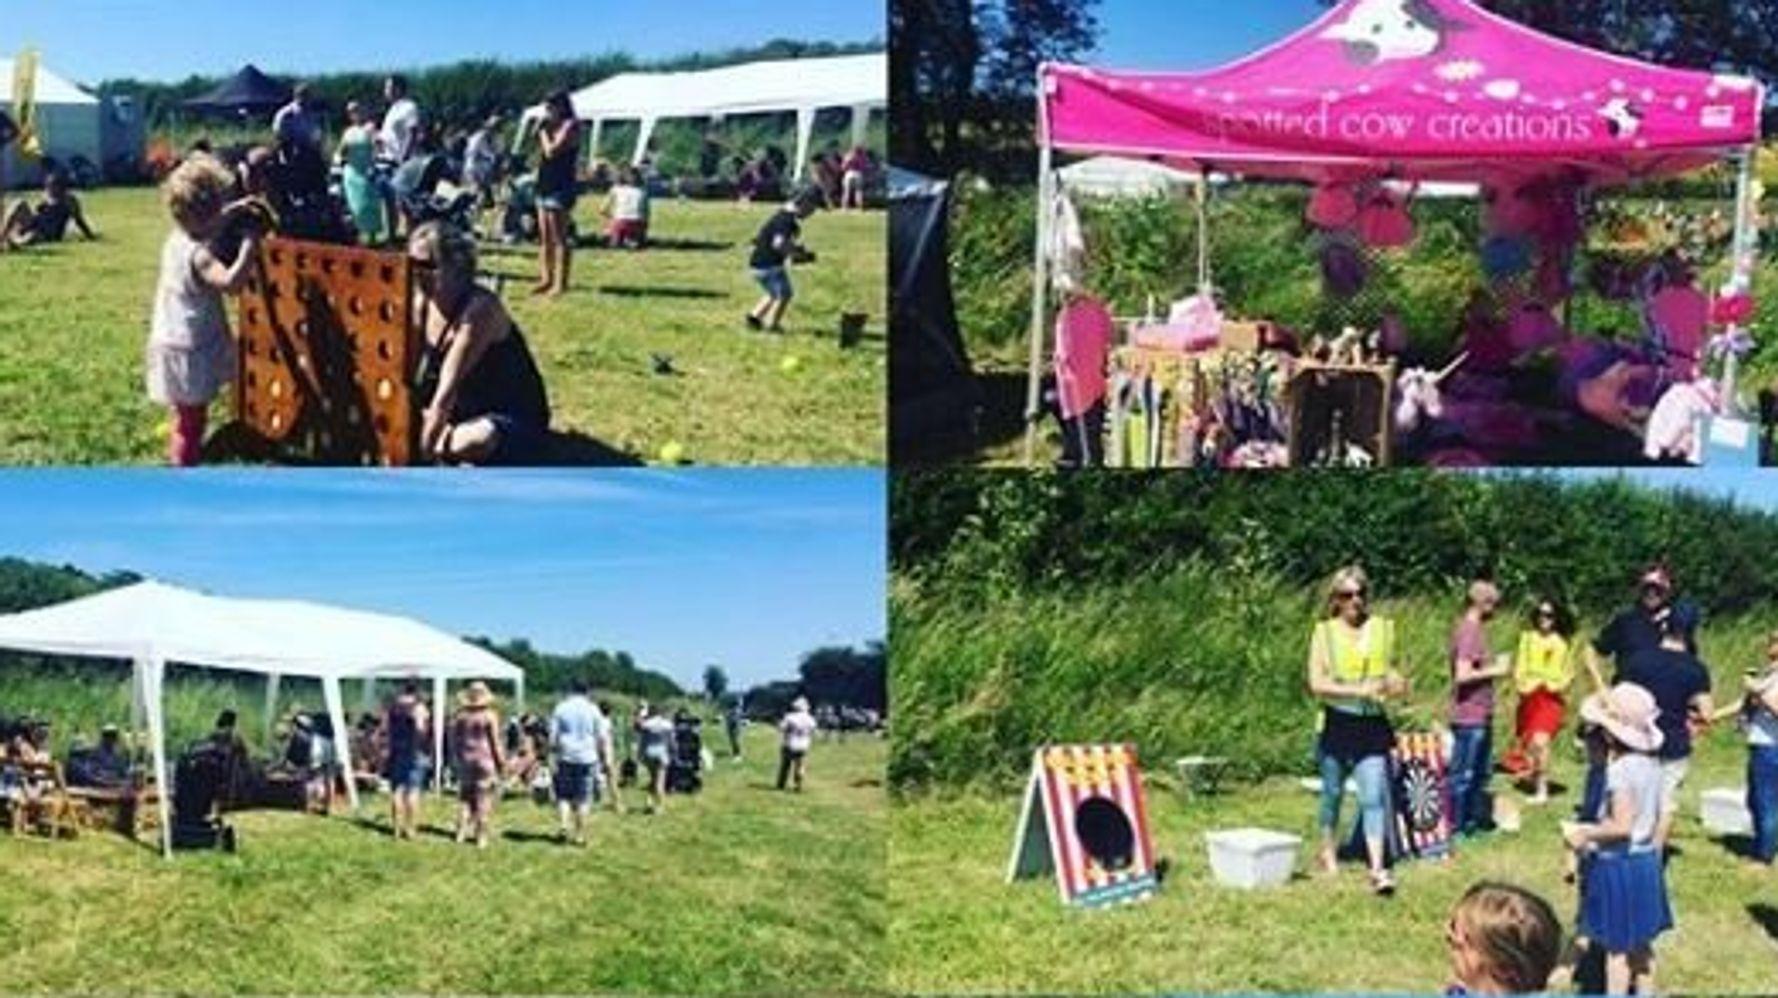 School Summer Fair Ideas To Make Your Fete A Roaring Success